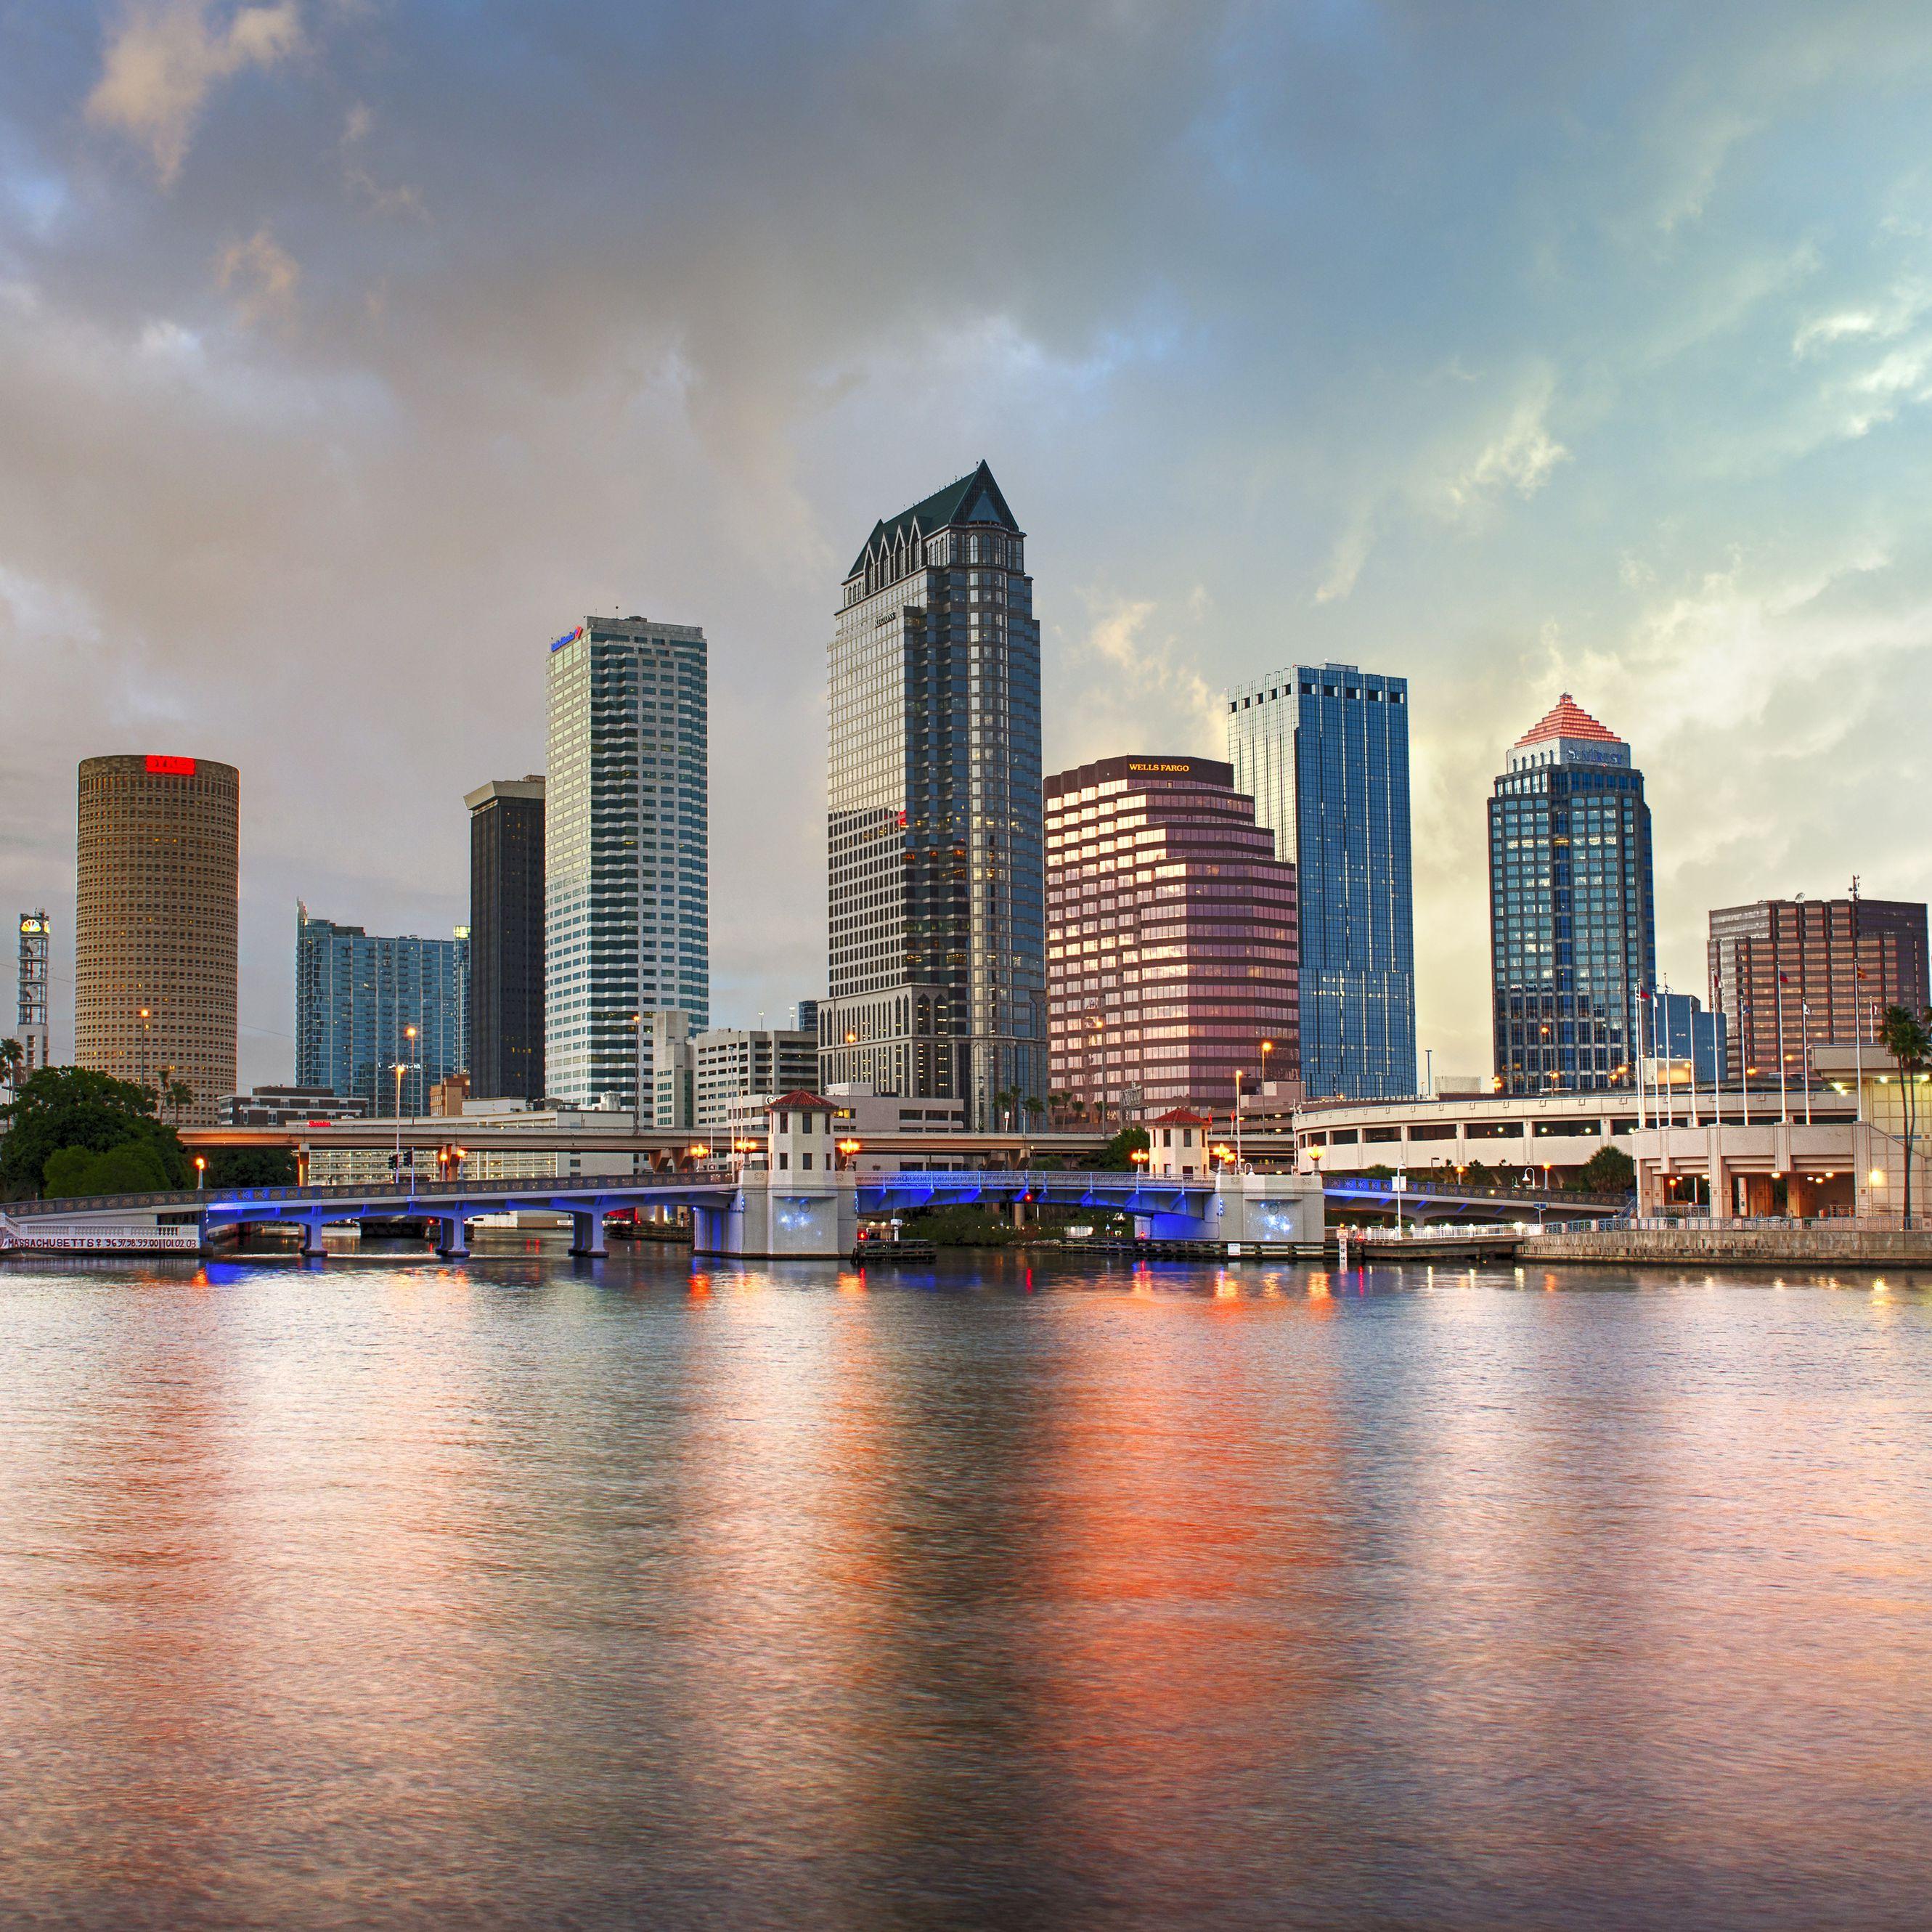 Waterfront Restaurants In Tampa Bay